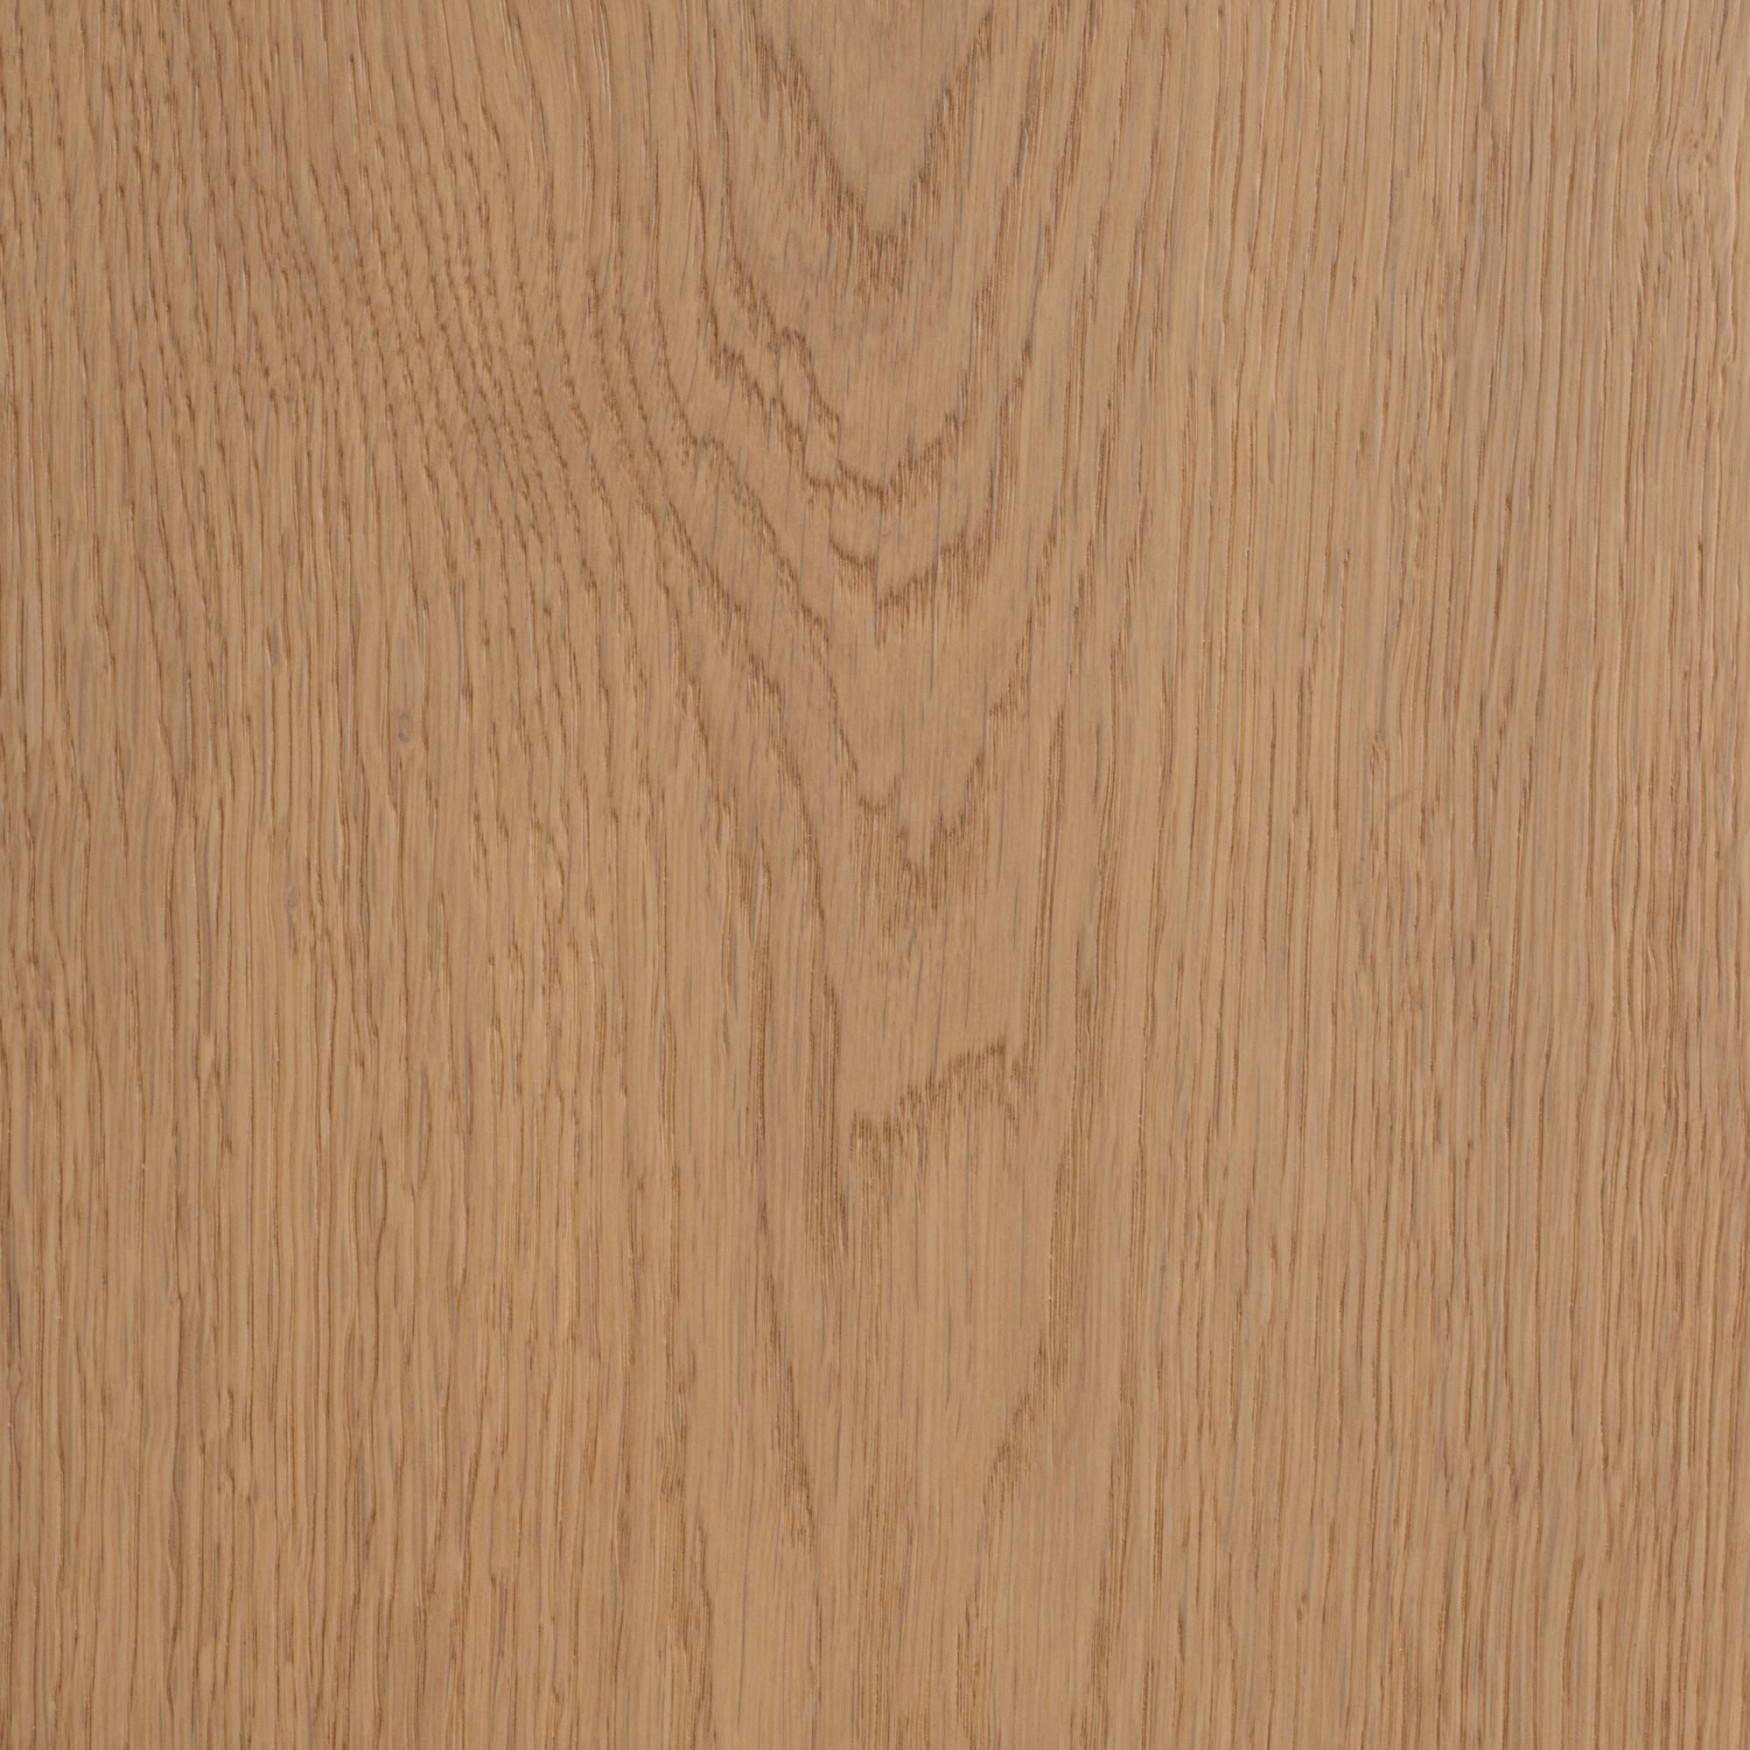 element7-wide-plank-samples-english-oak